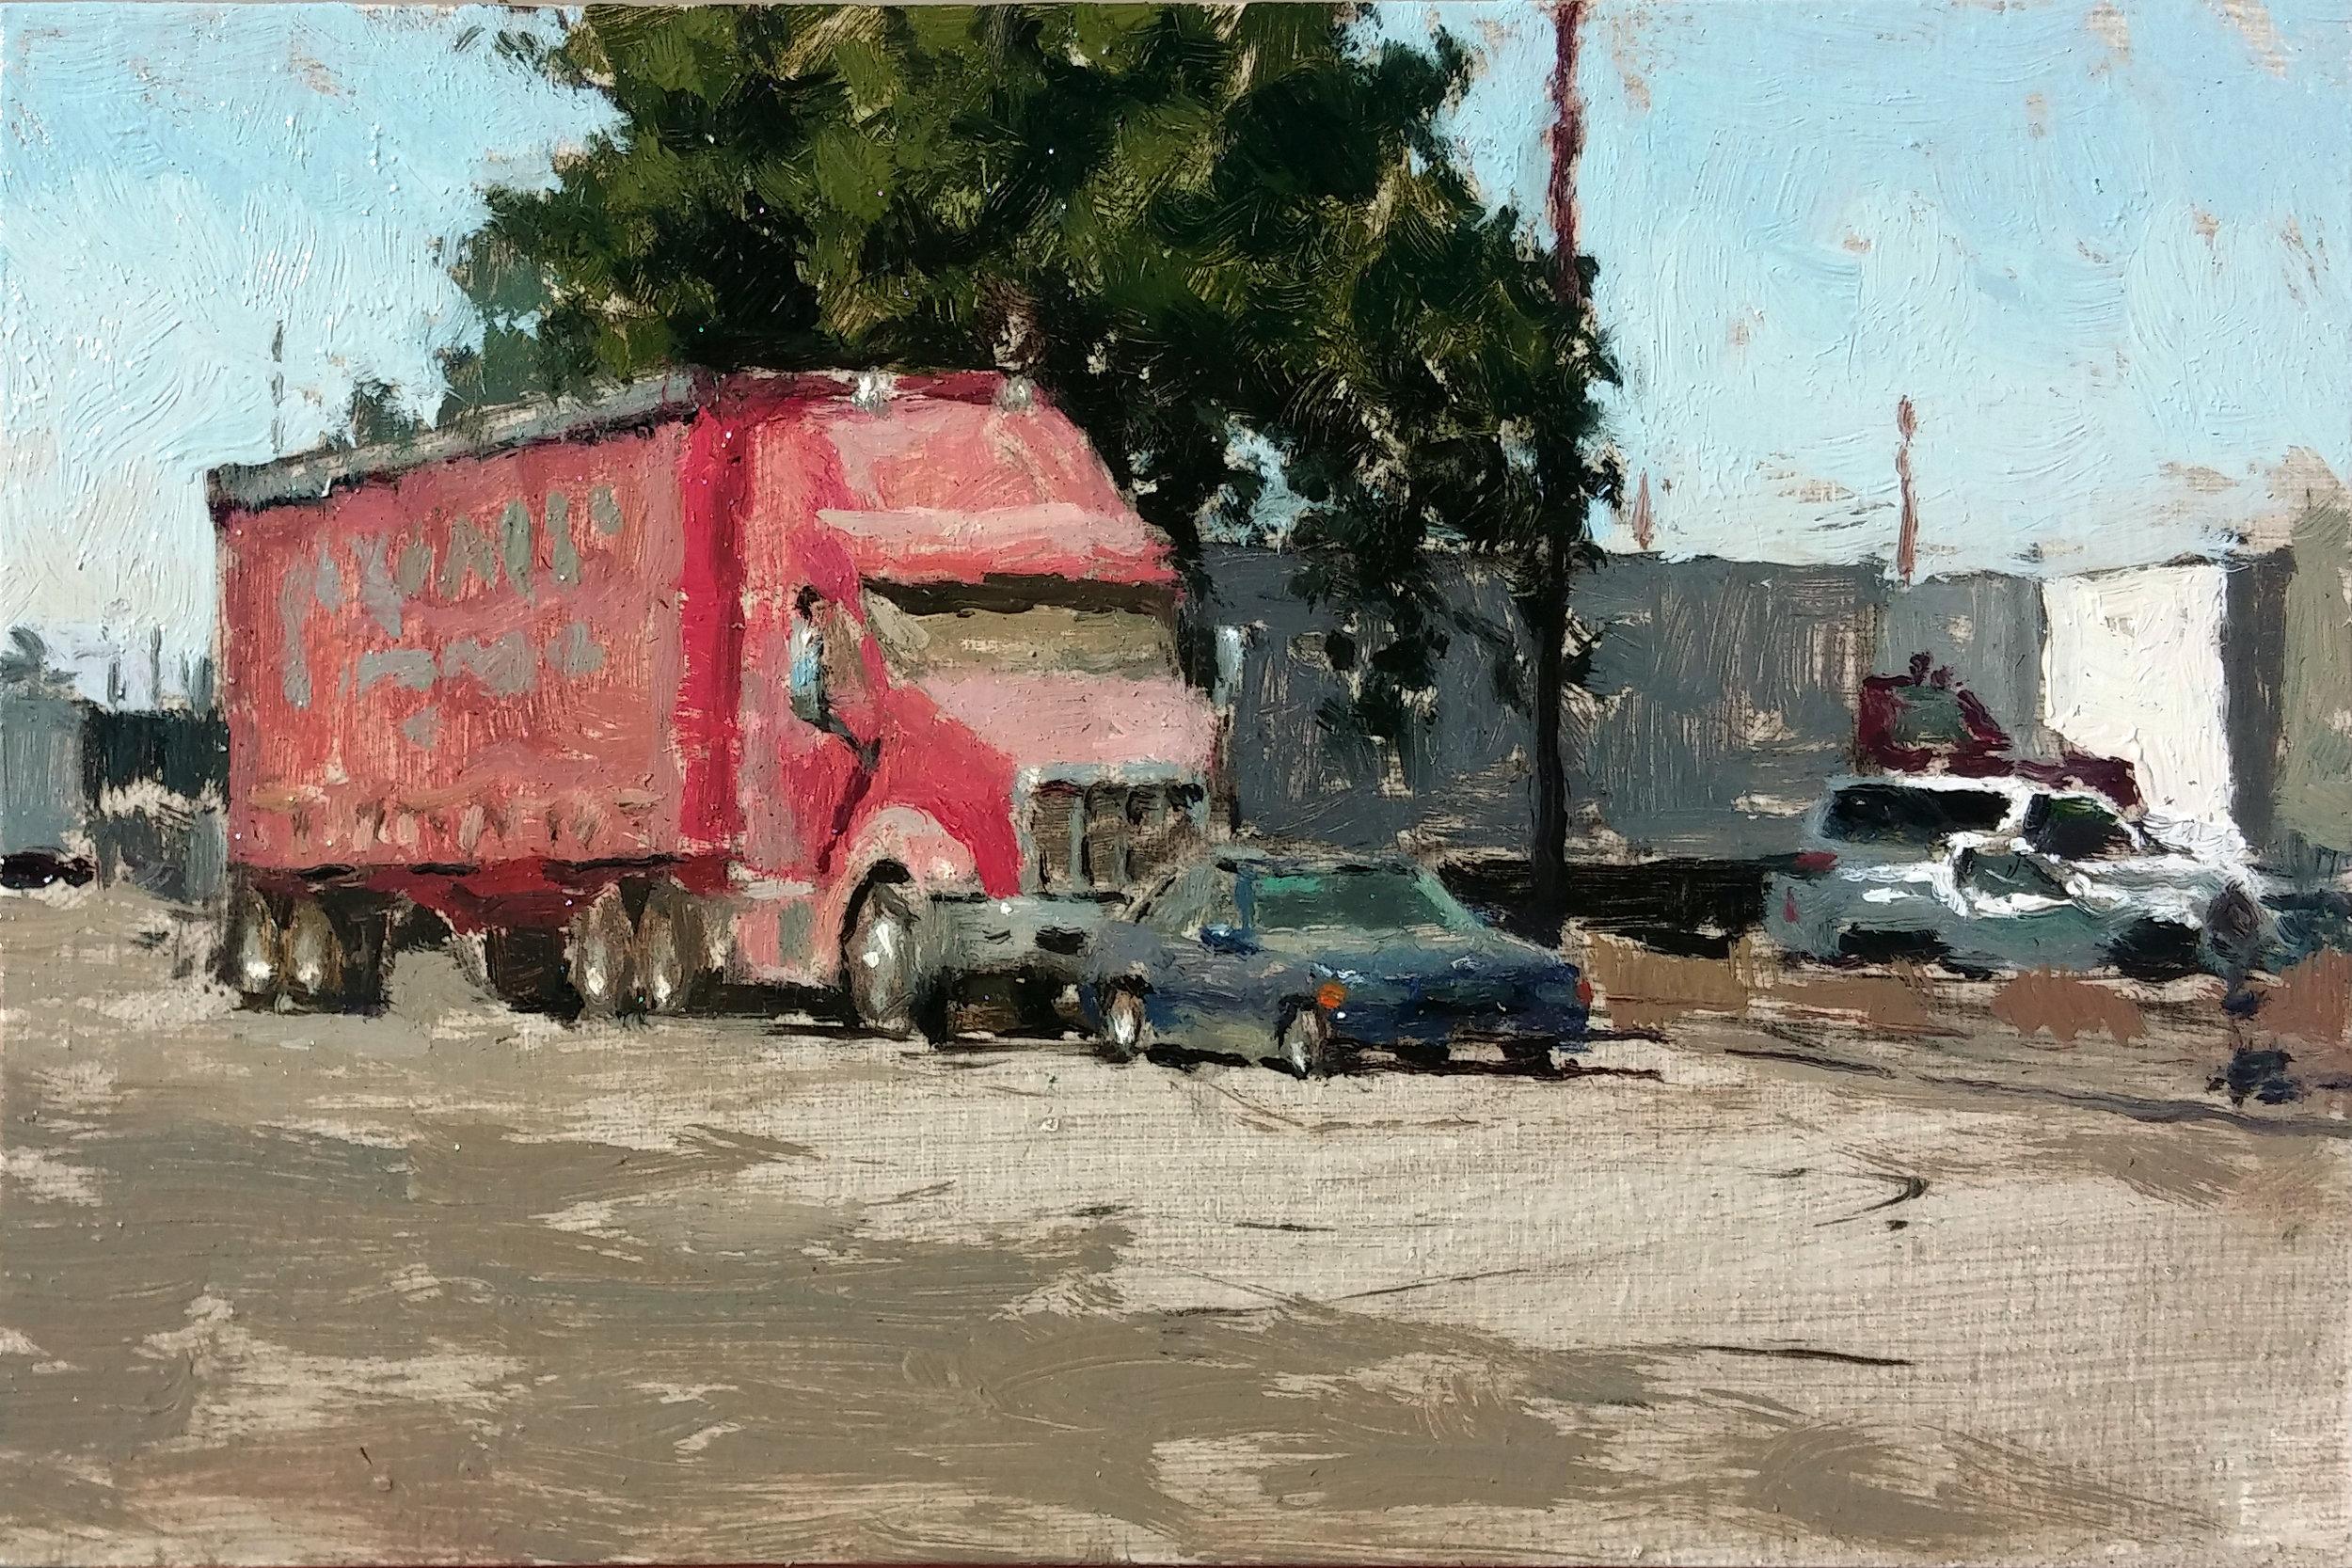 trucks-midday-effect - Copy.jpg